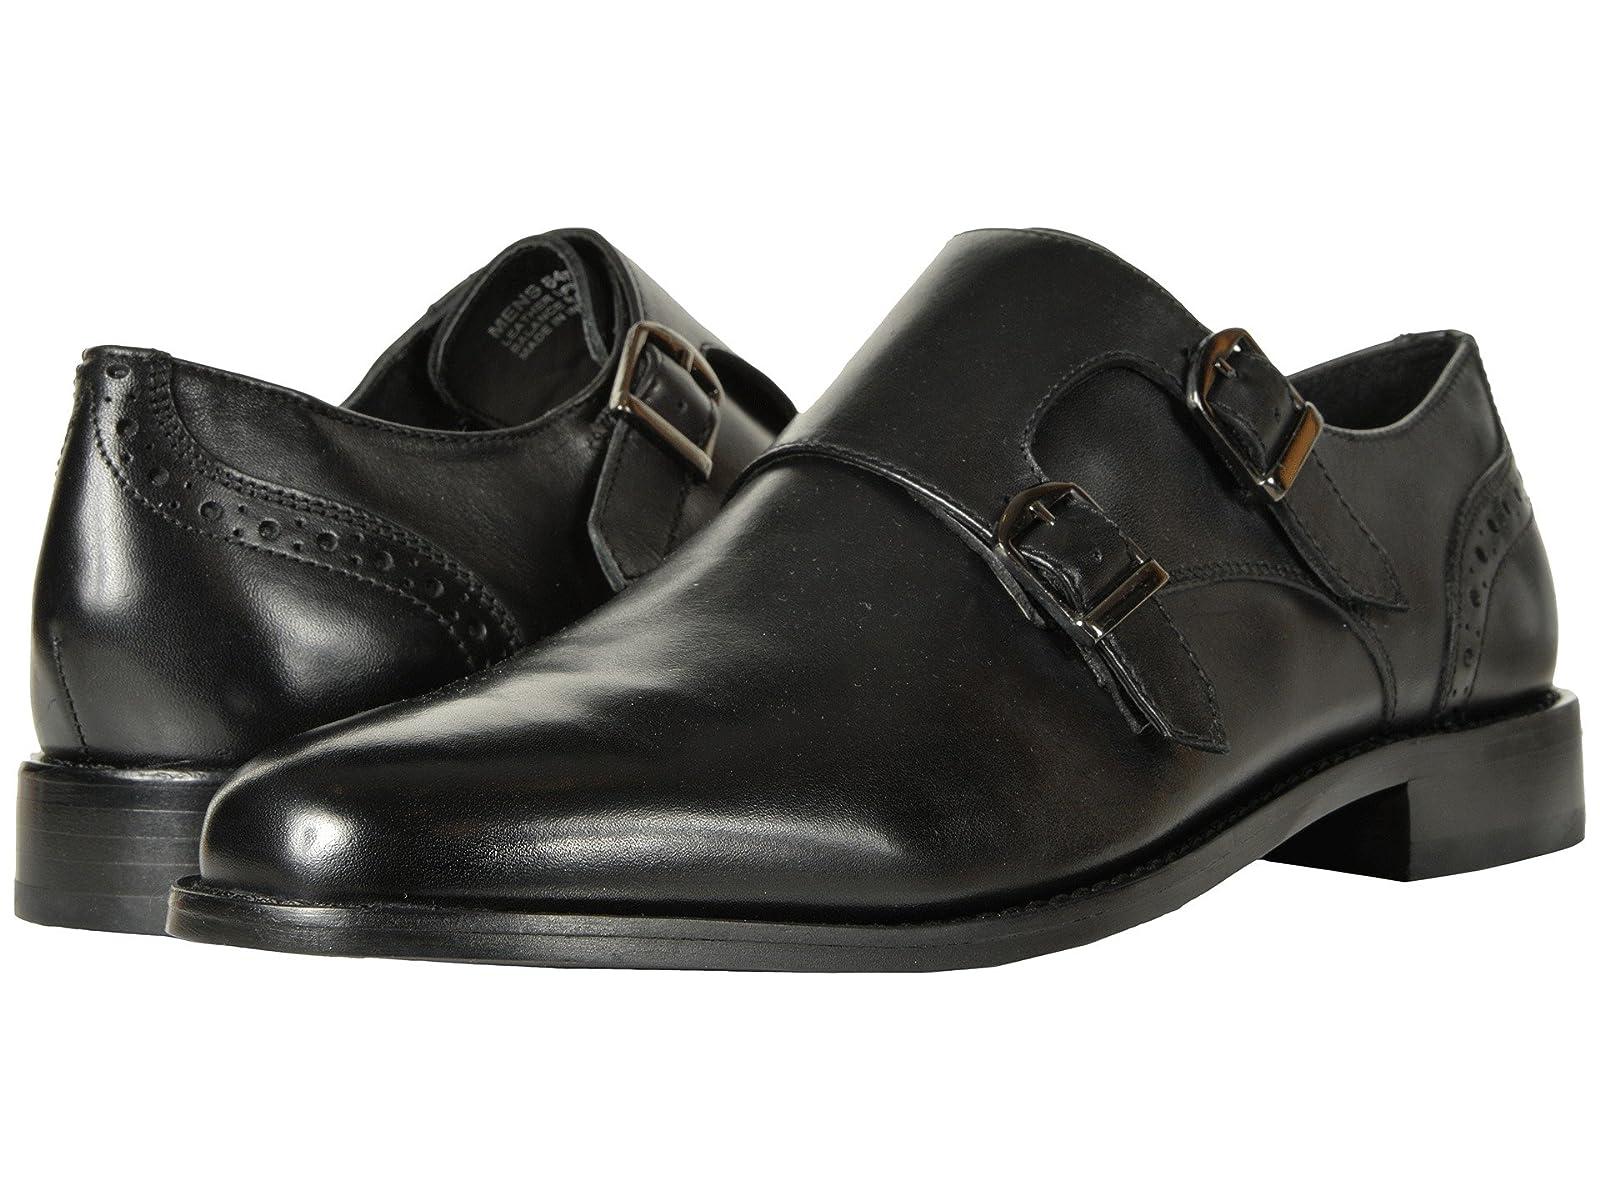 Nunn Bush Norway Plain Toe Double Monk Dress Casual Slip-OnAtmospheric grades have affordable shoes